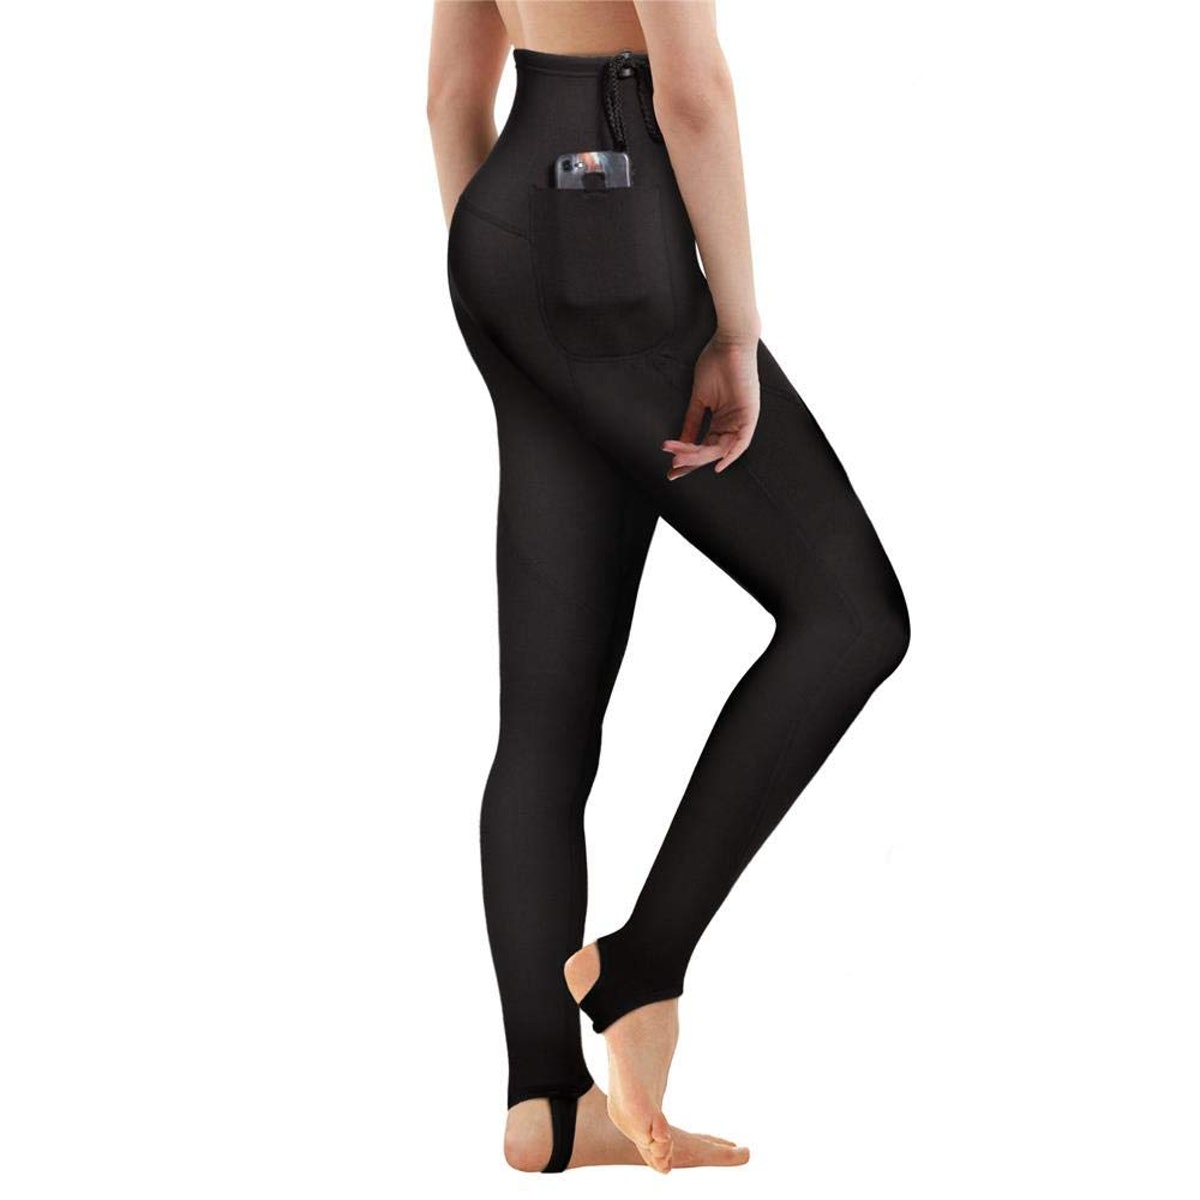 CtriLady Wetsuit Pants